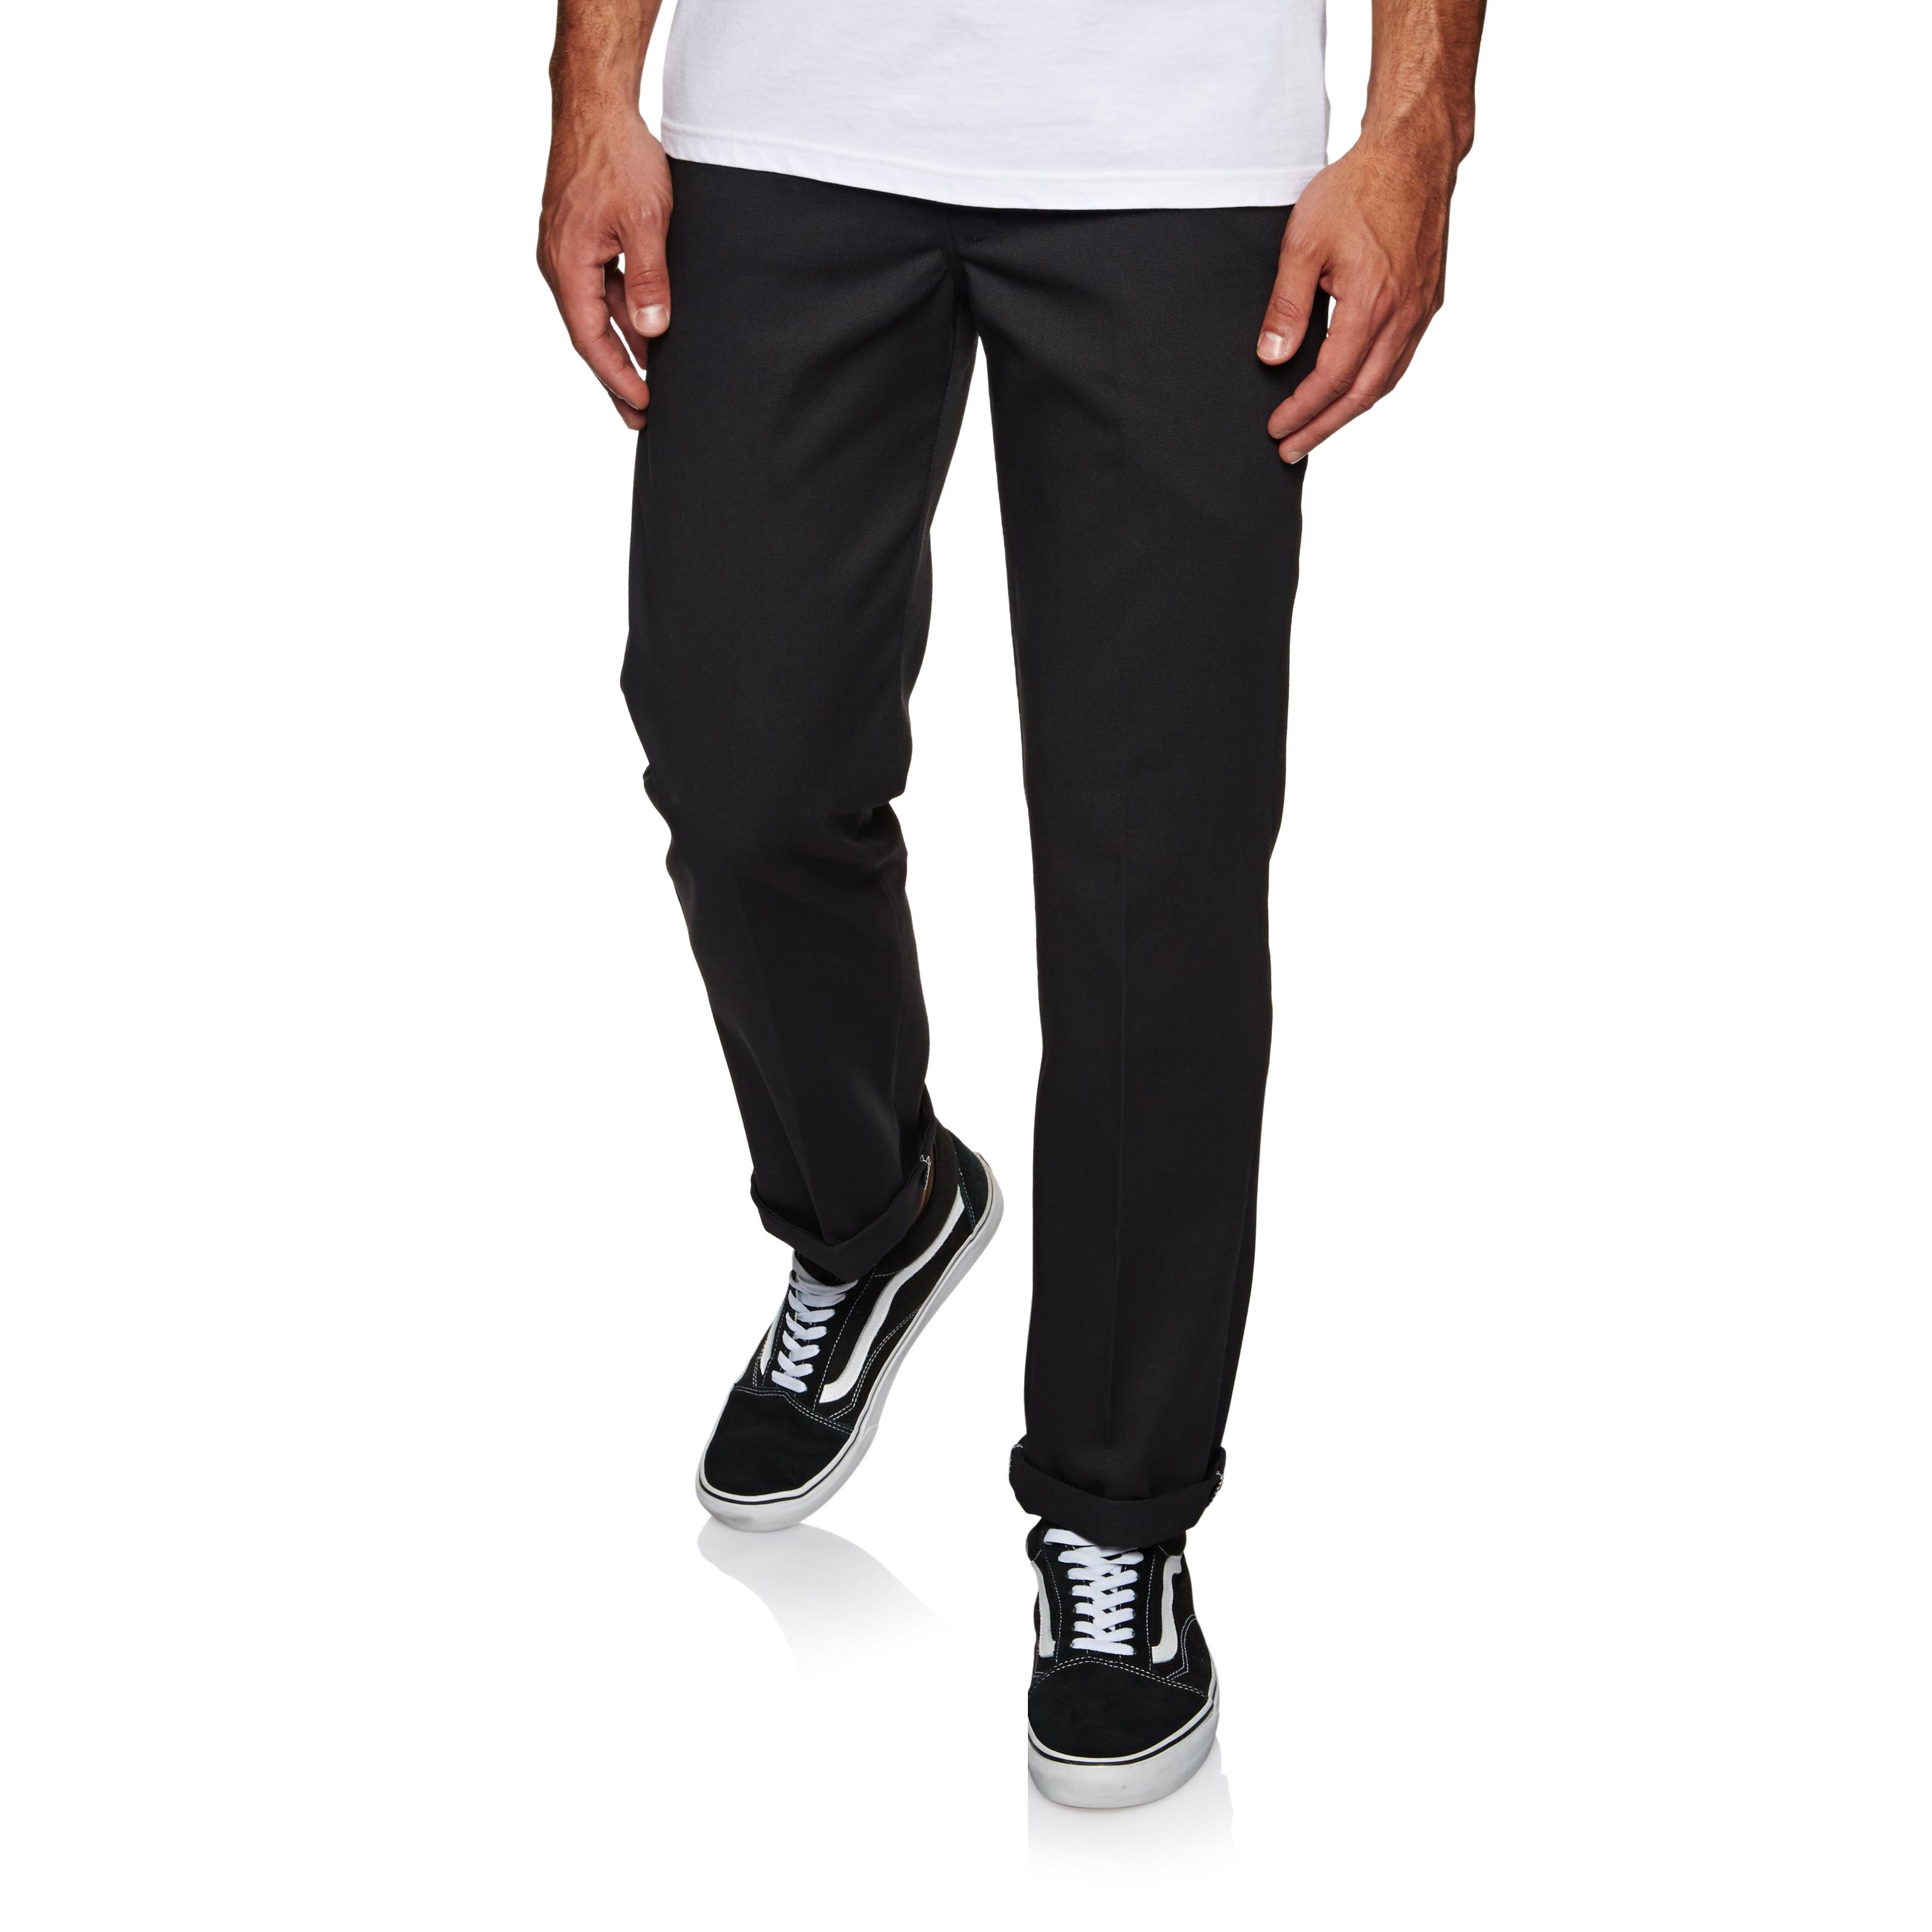 Dickies Mens Straight Work Slim Trousers Chocolate Brown 32W x 30L